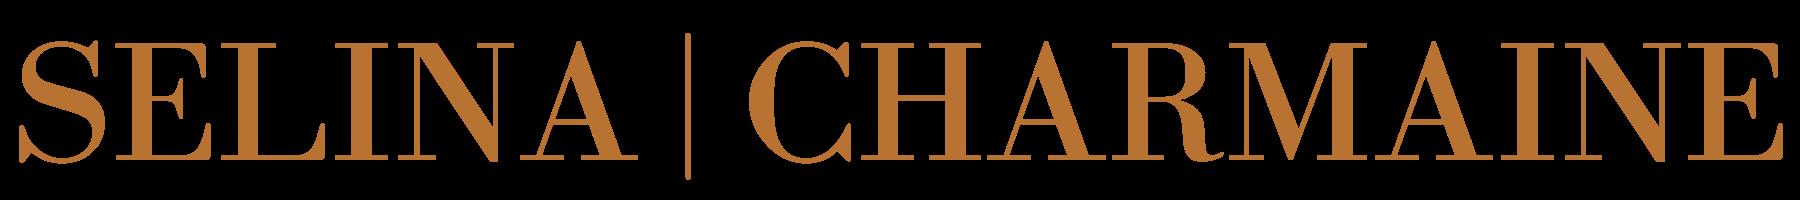 Selina Charmaine logo